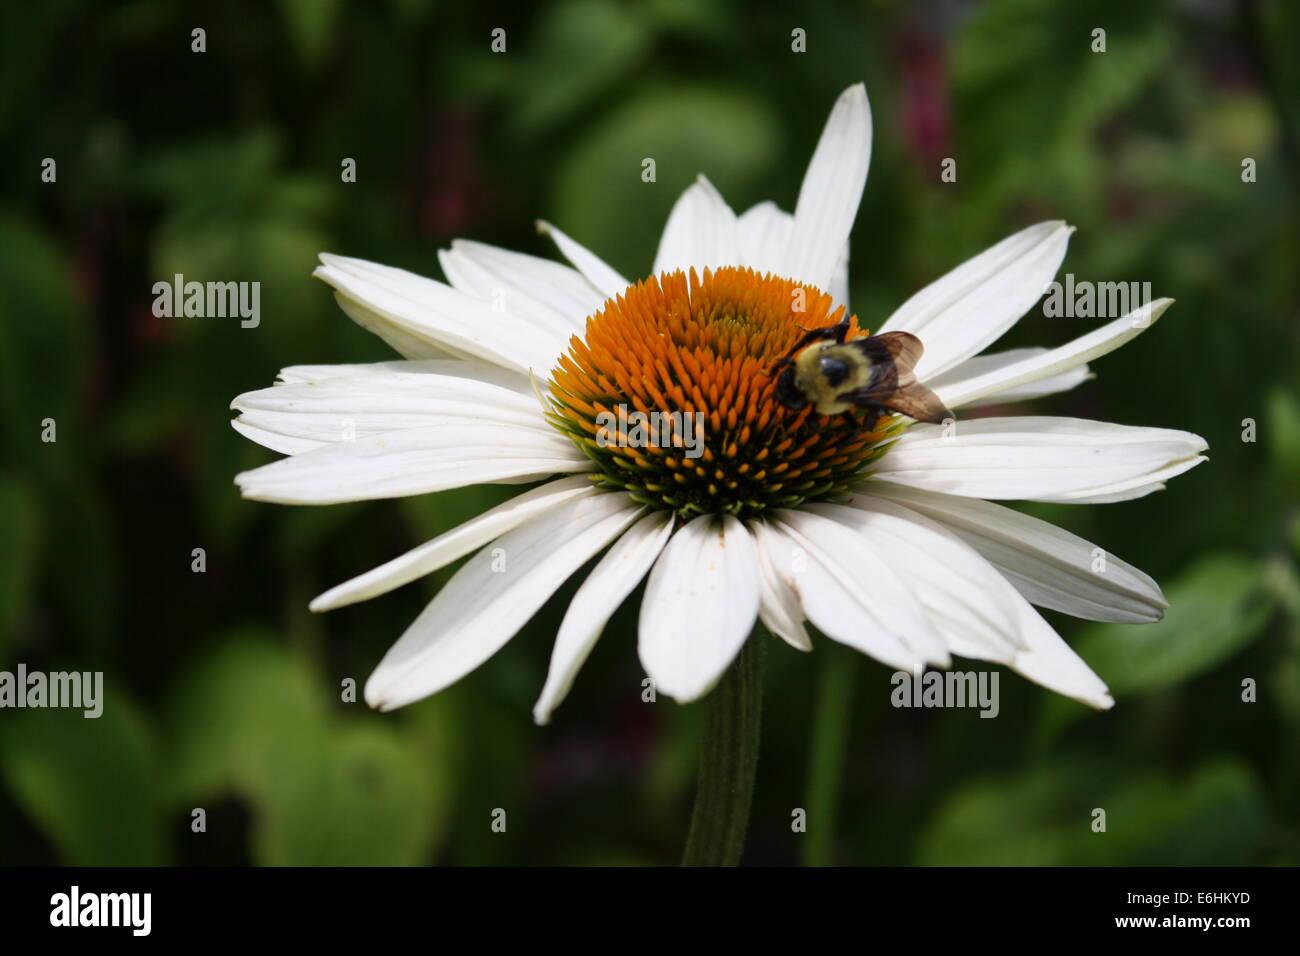 Fall Perennials, White Daisy and Bee - Stock Image